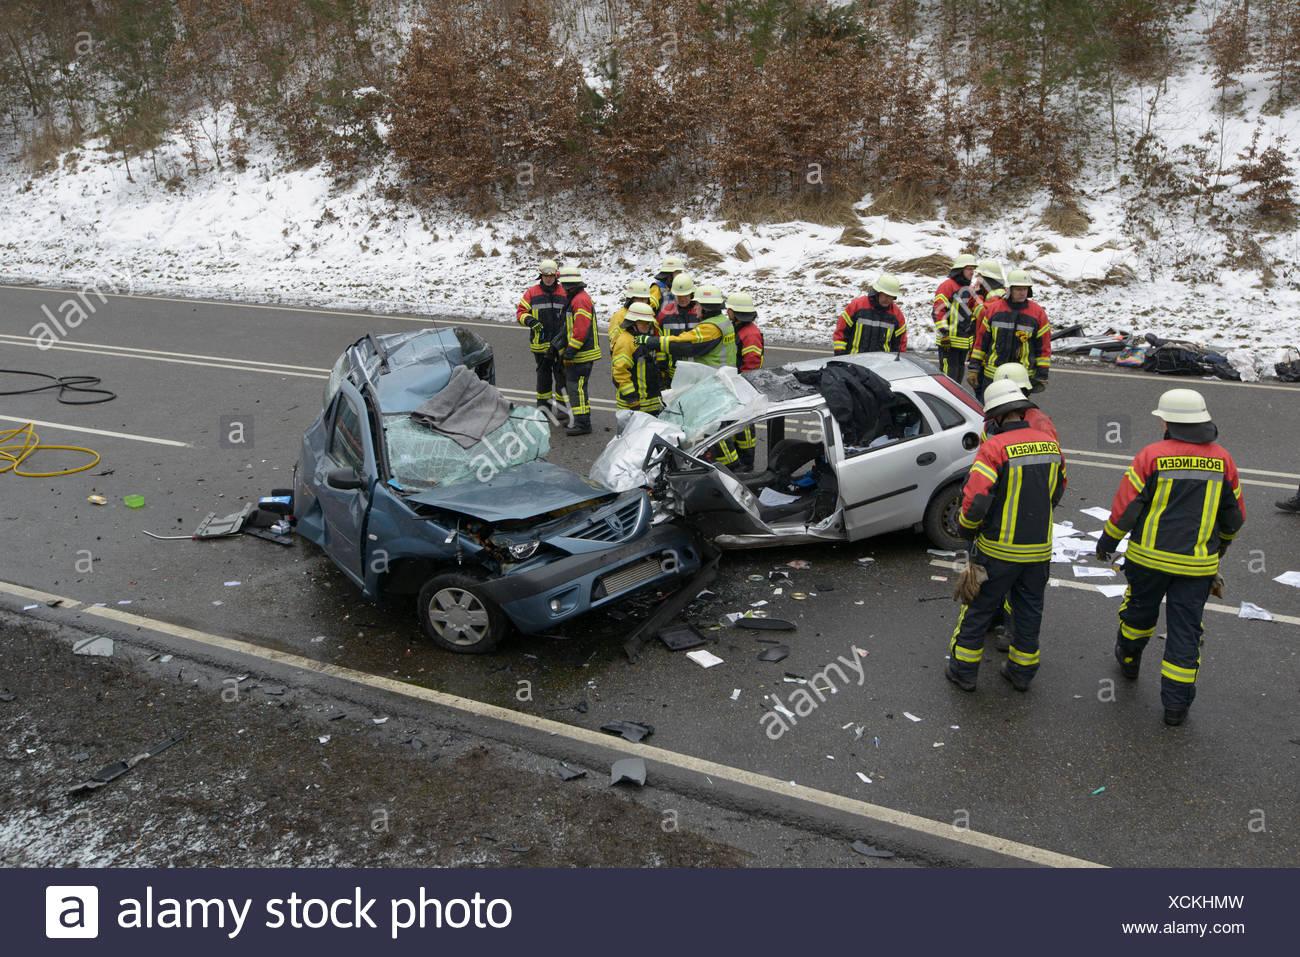 Colisión de un Dacia Logan con un Opel Corsa, lugar del accidente, Böblingen, Baden-Württemberg, Alemania Imagen De Stock